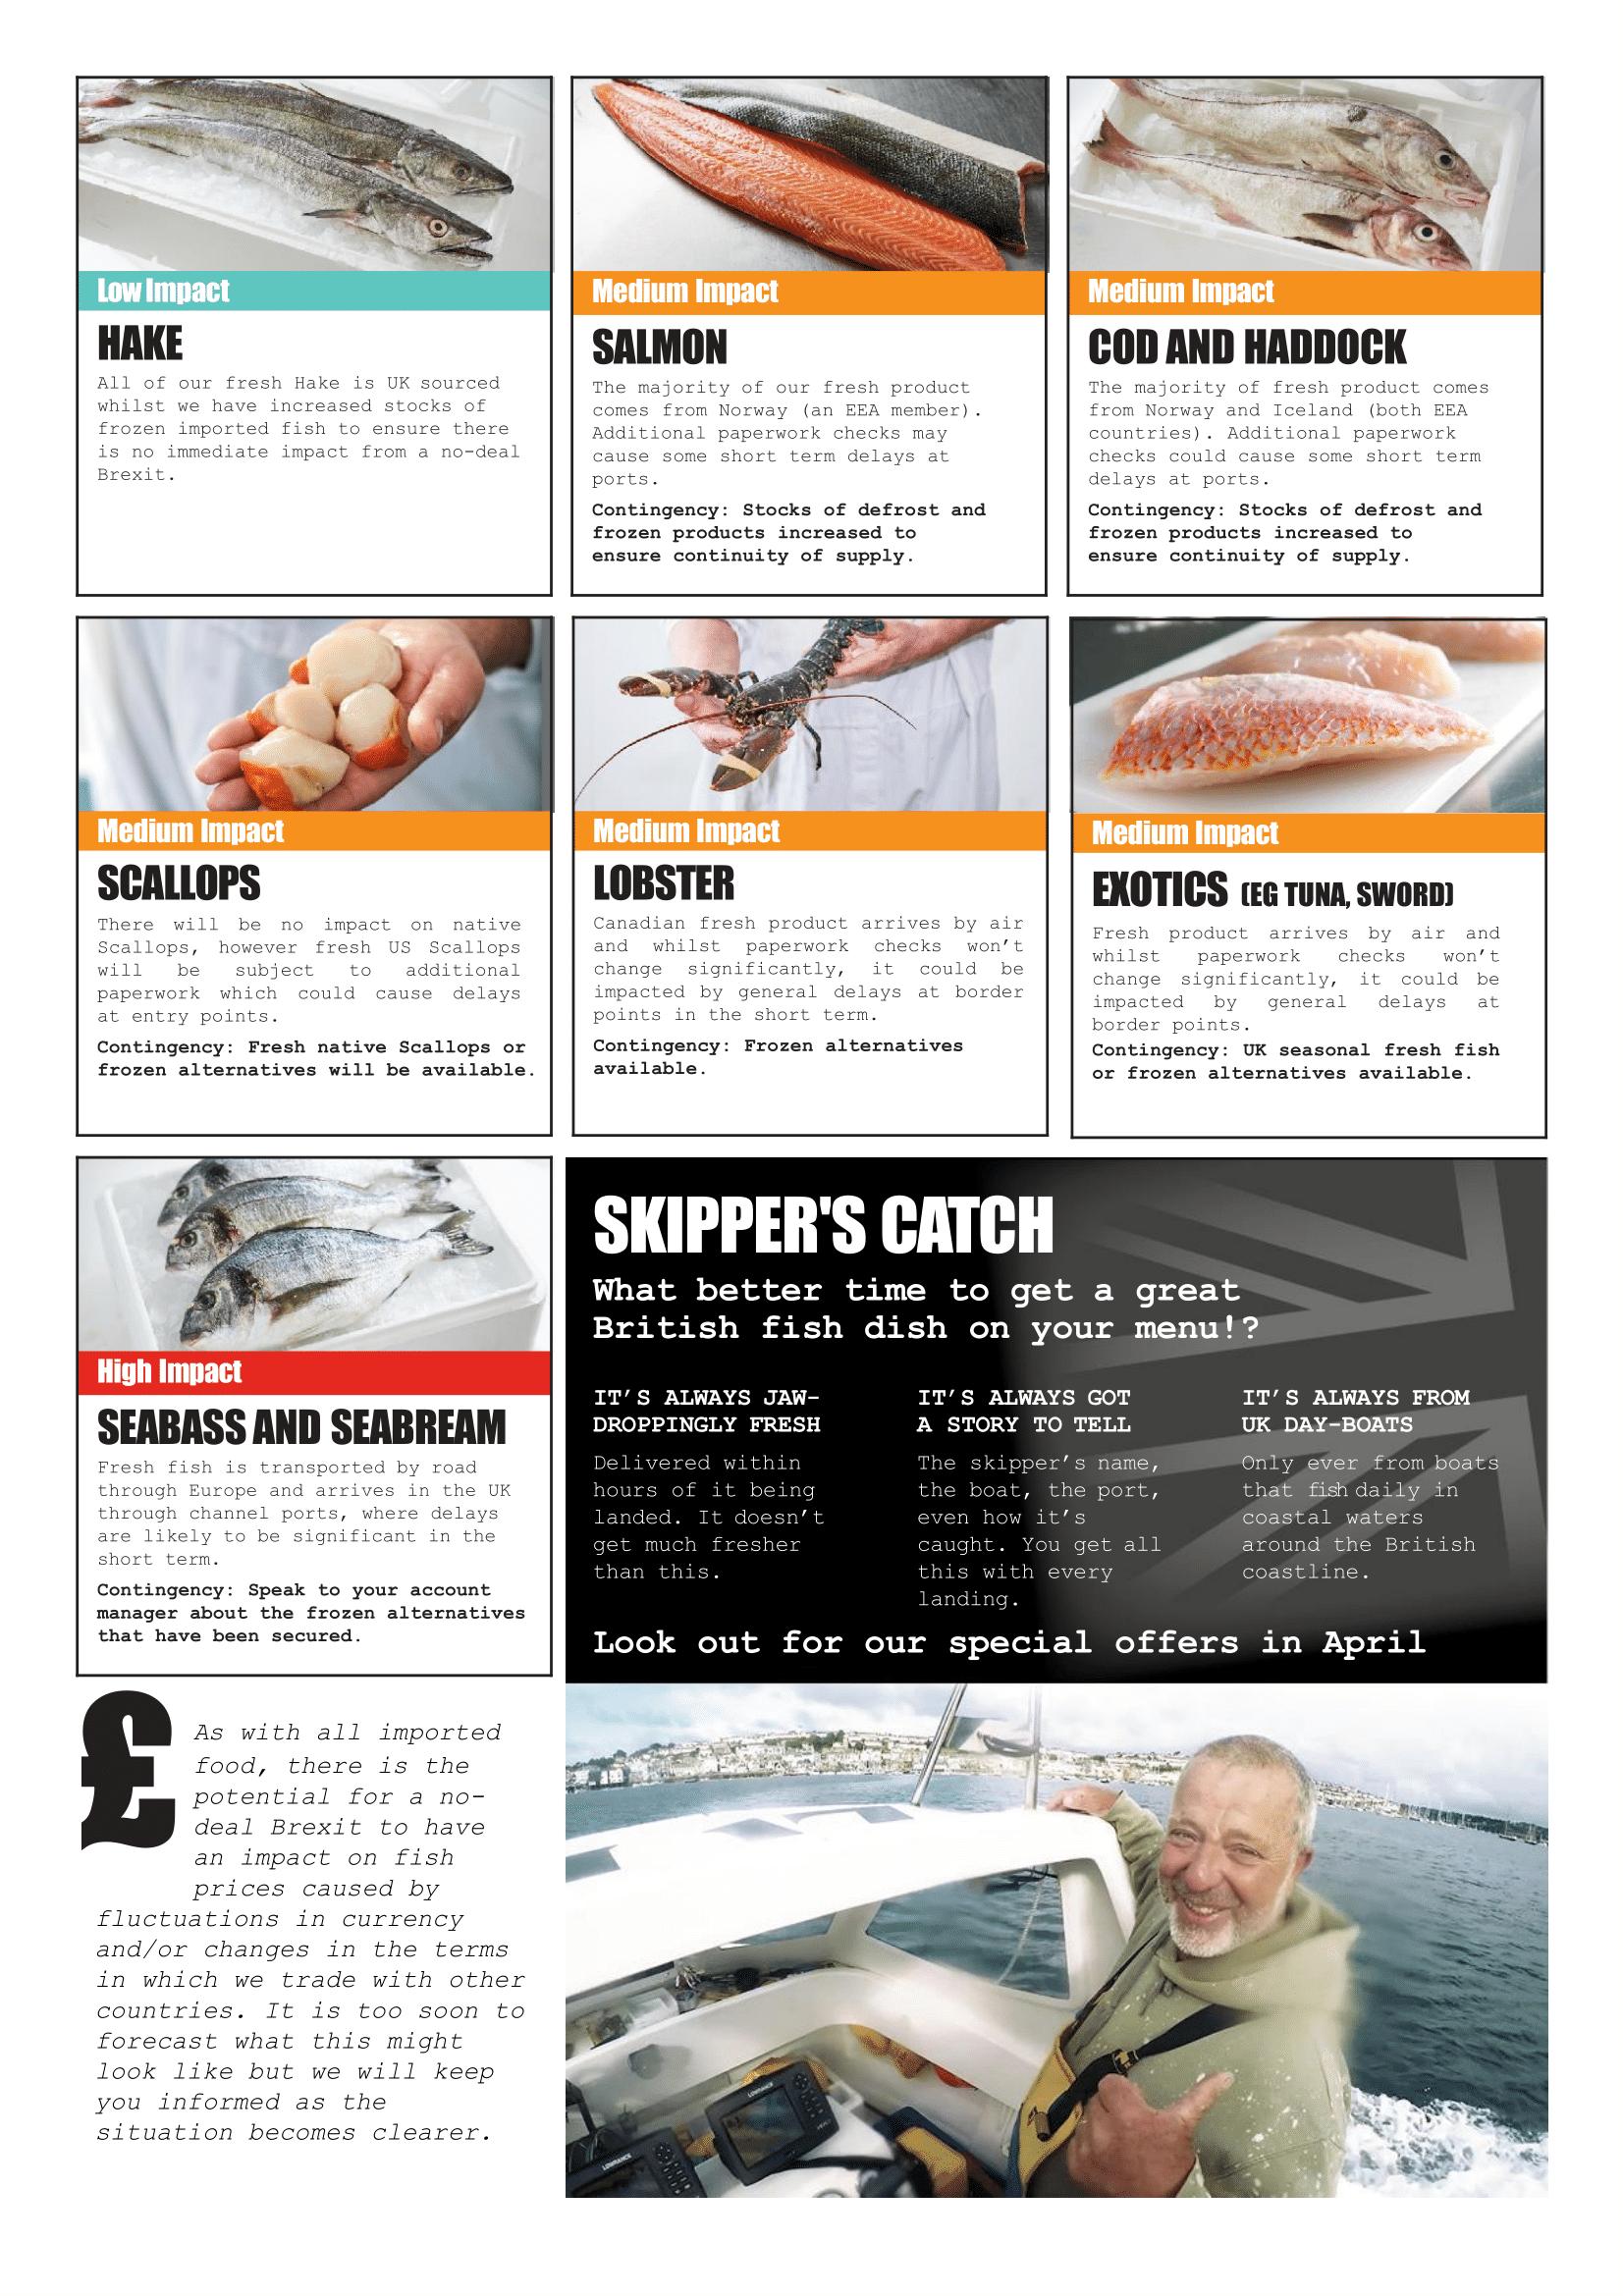 Brexit Imapct by Species - M&J Seafood-2.png